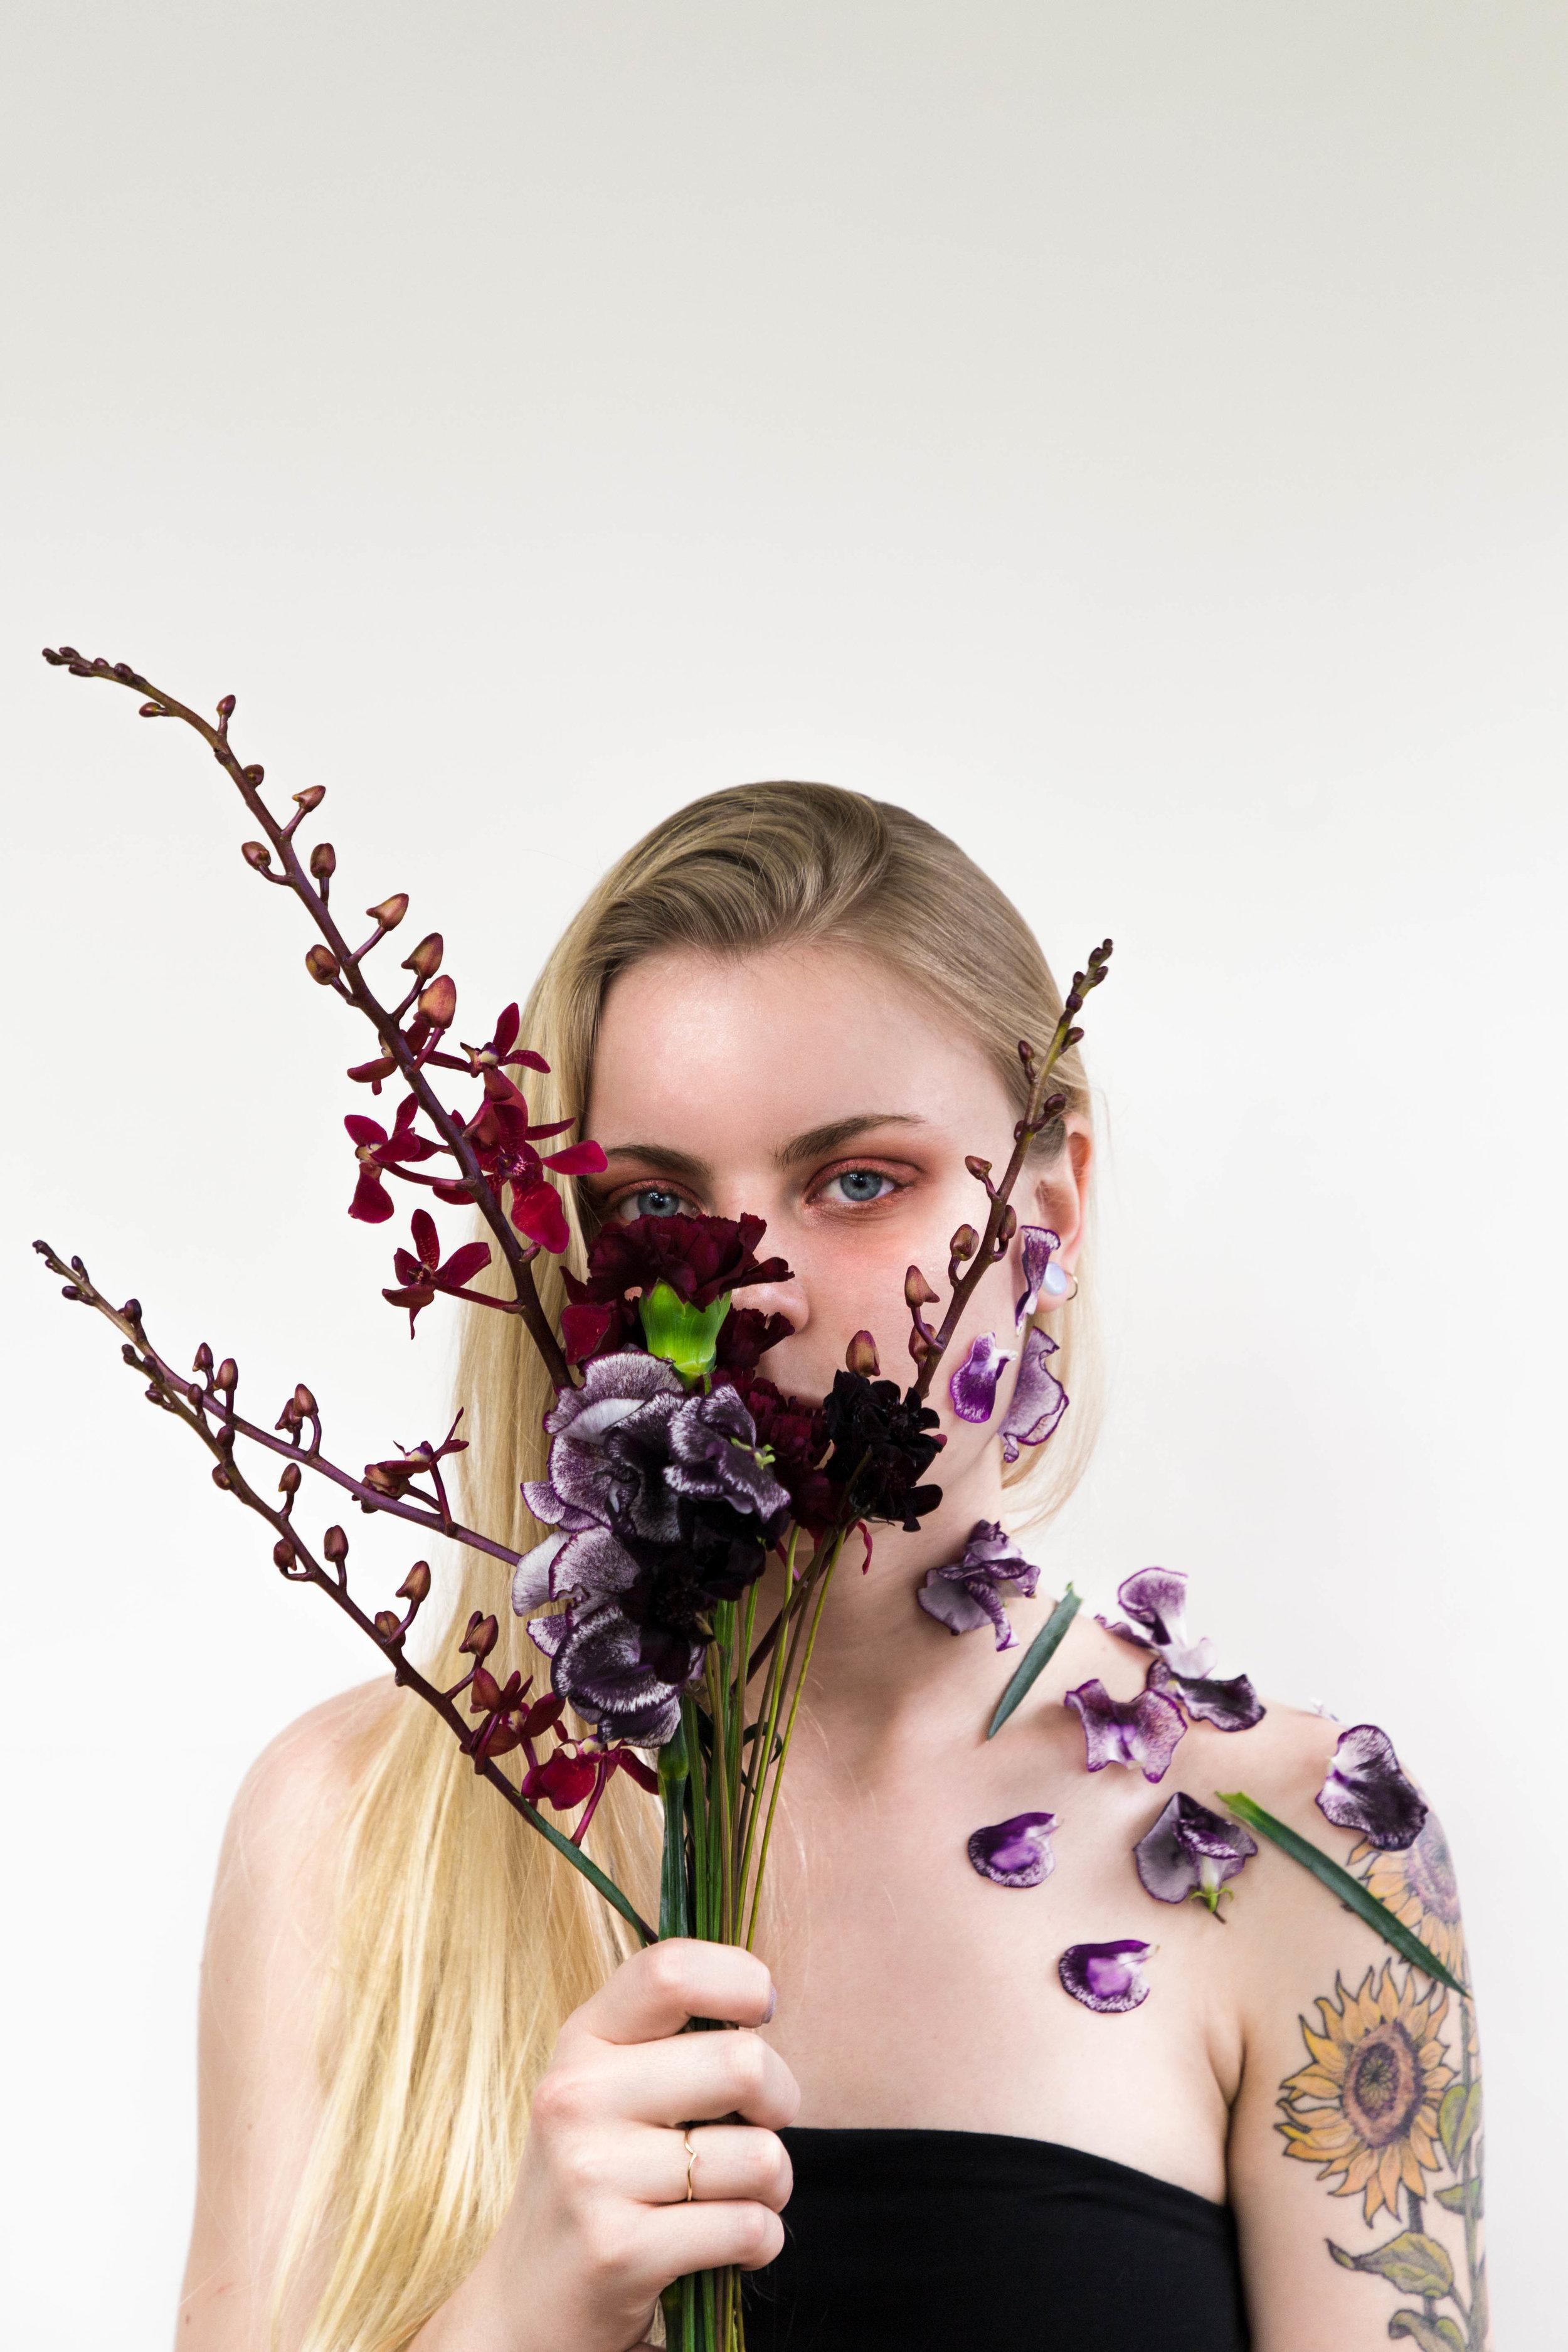 20171219_Flowers_Chanel_Emma_Sho_0010.jpg